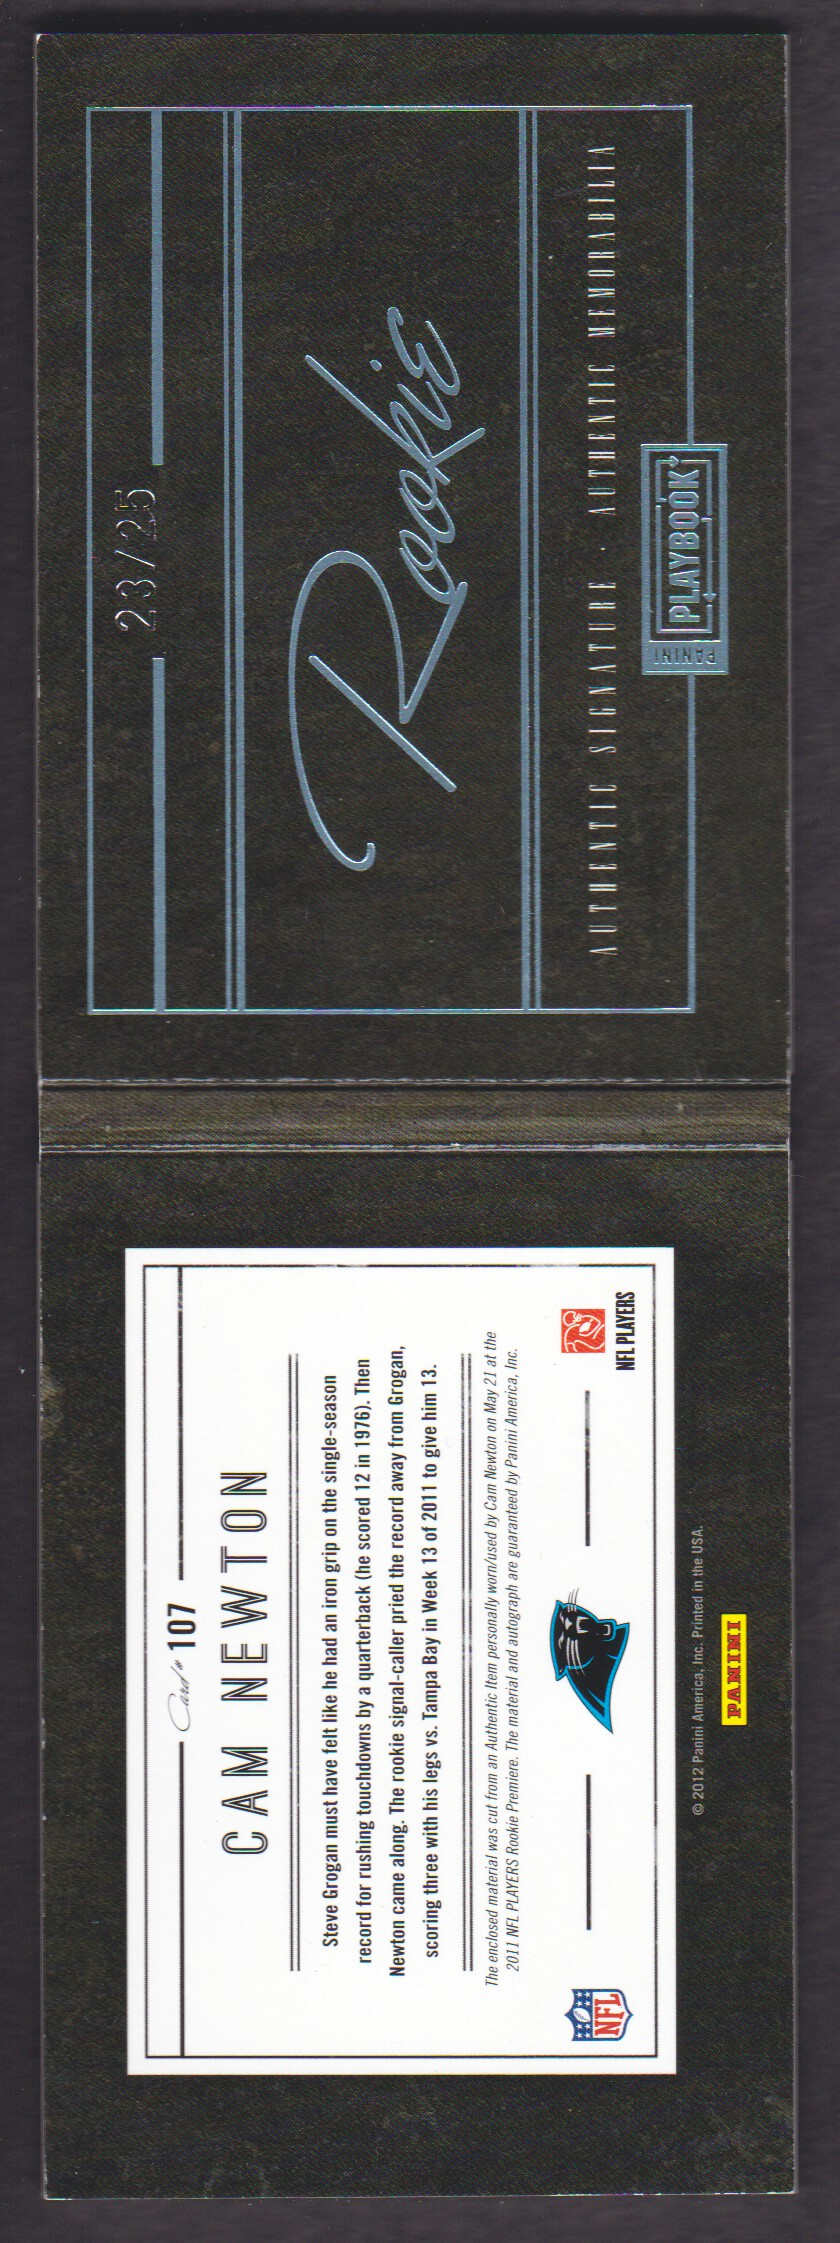 2011 Panini Playbook Platinum #107 Cam Newton JSY AU back image